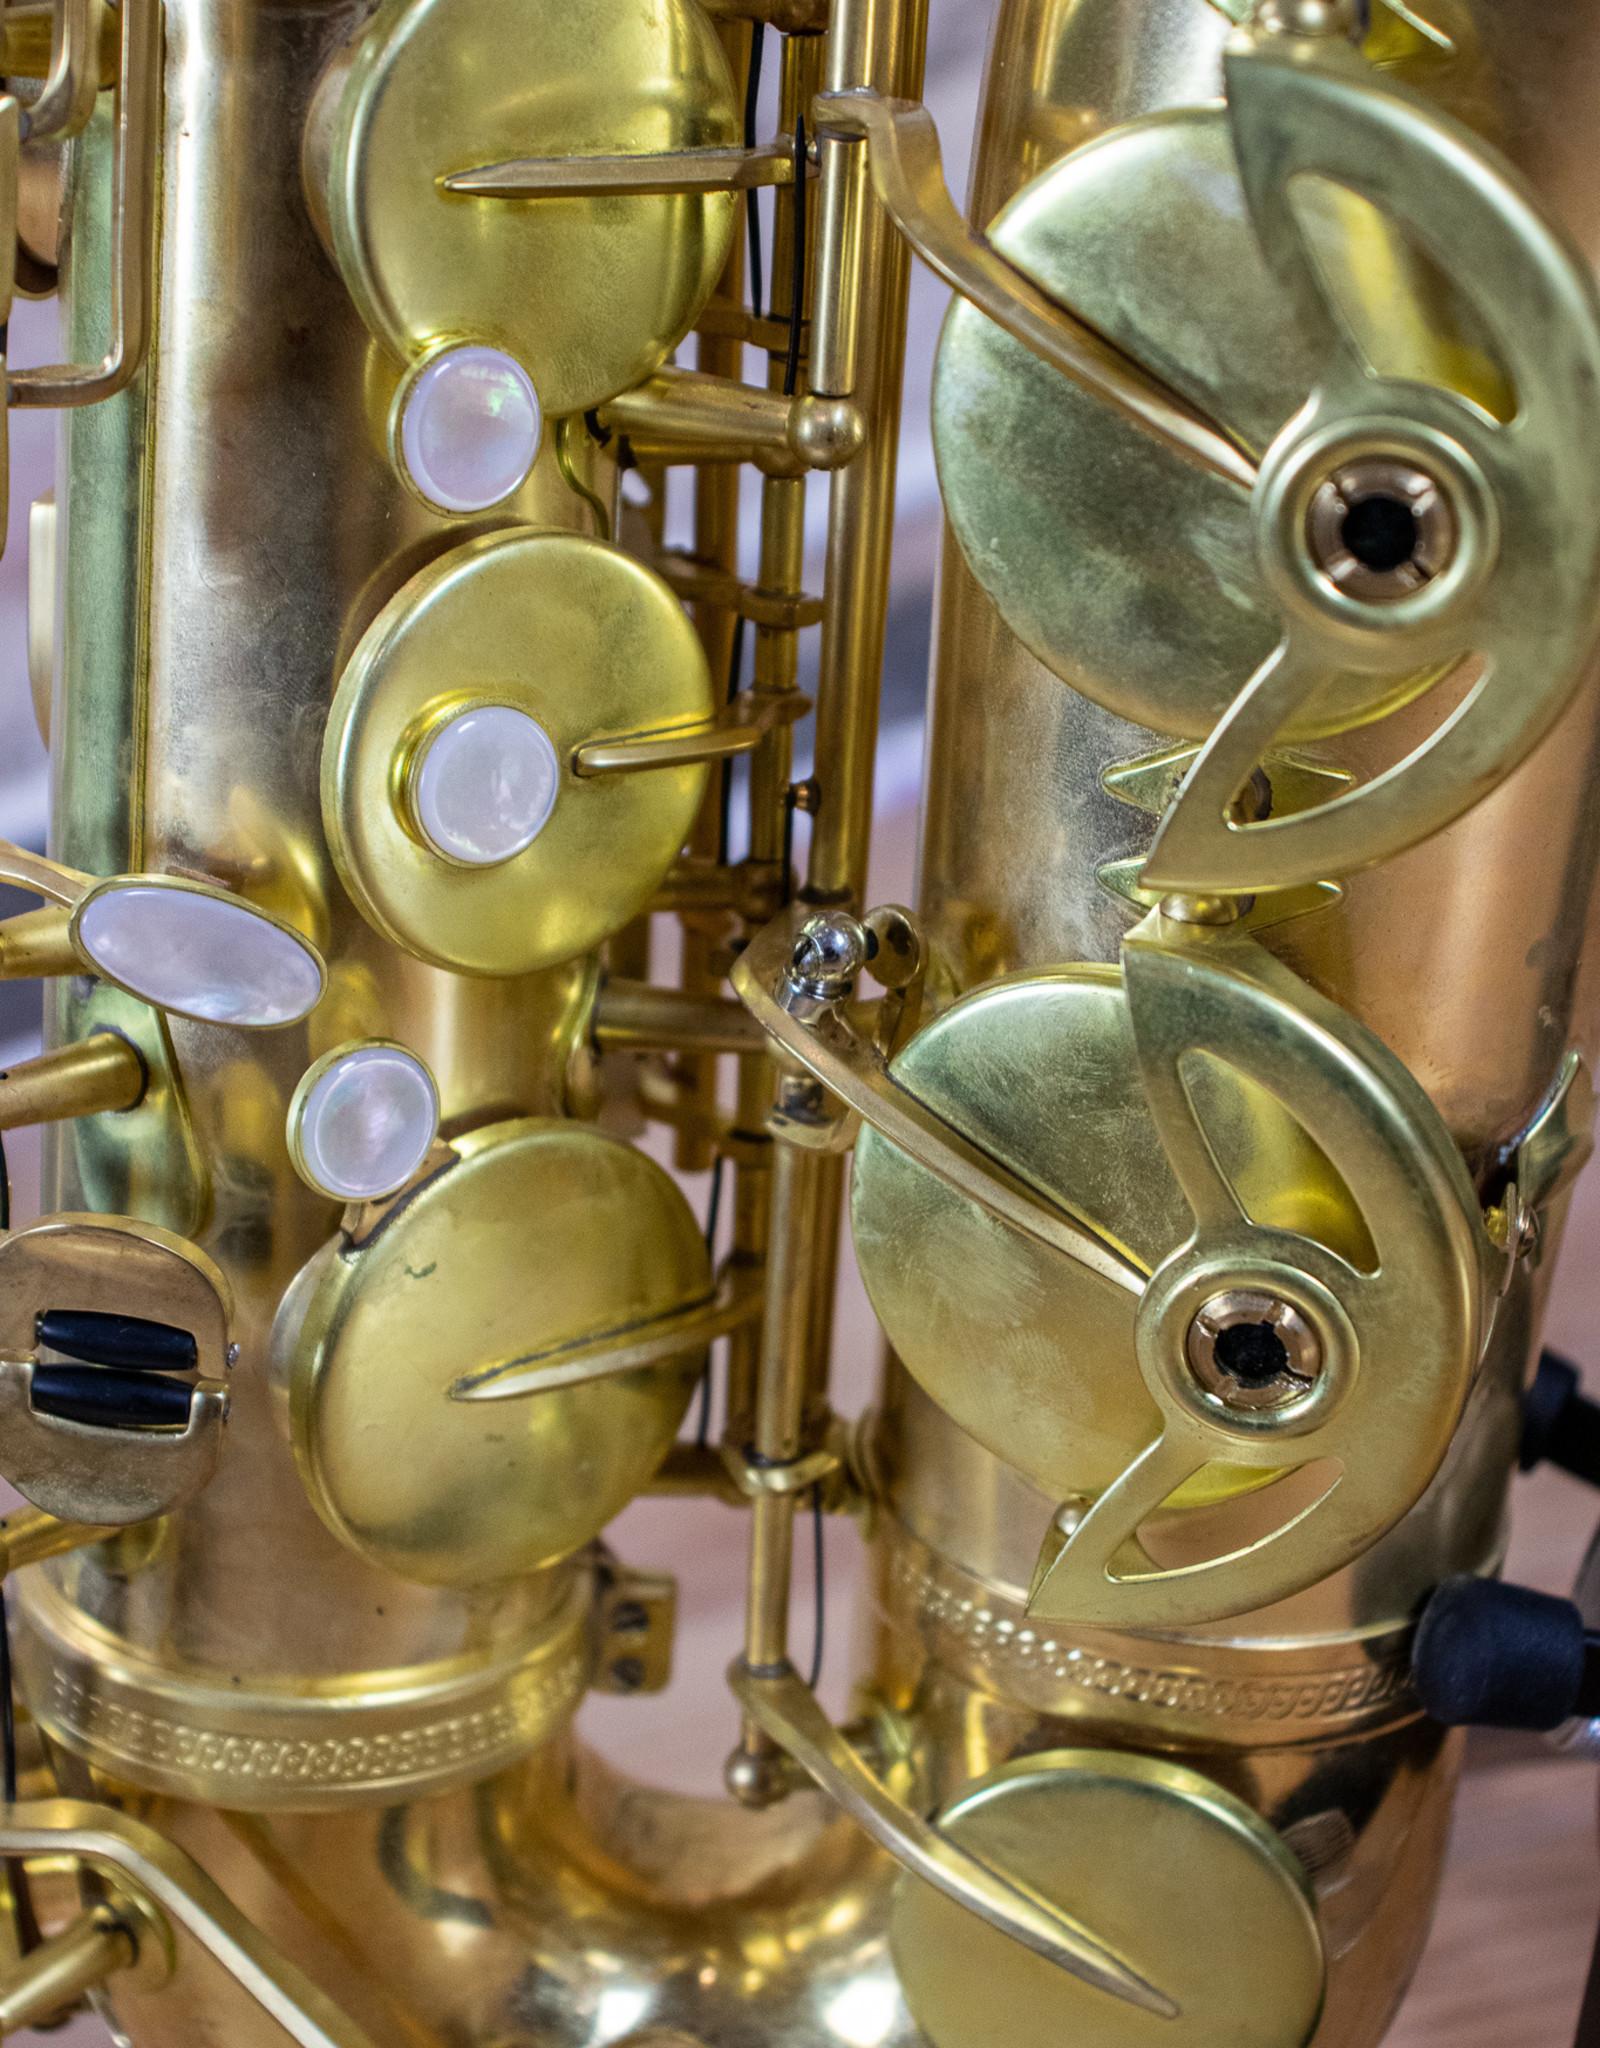 JL Woodwinds New York Signature Series Rose Brass Unlacquered Tenor Saxophone